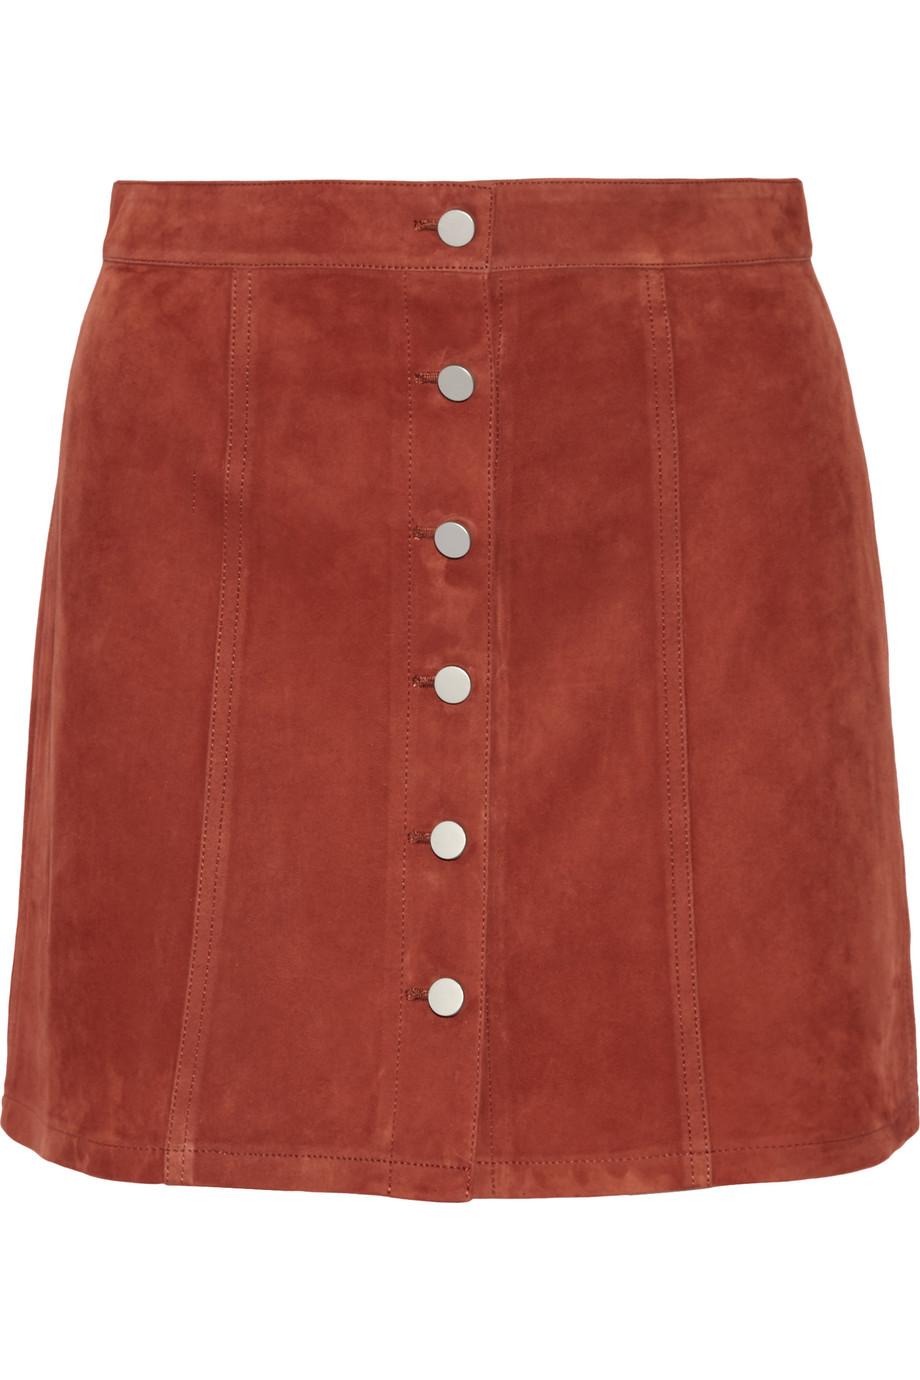 Theory Benna Suede Mini Skirt, Camel, Women's, Size: 0